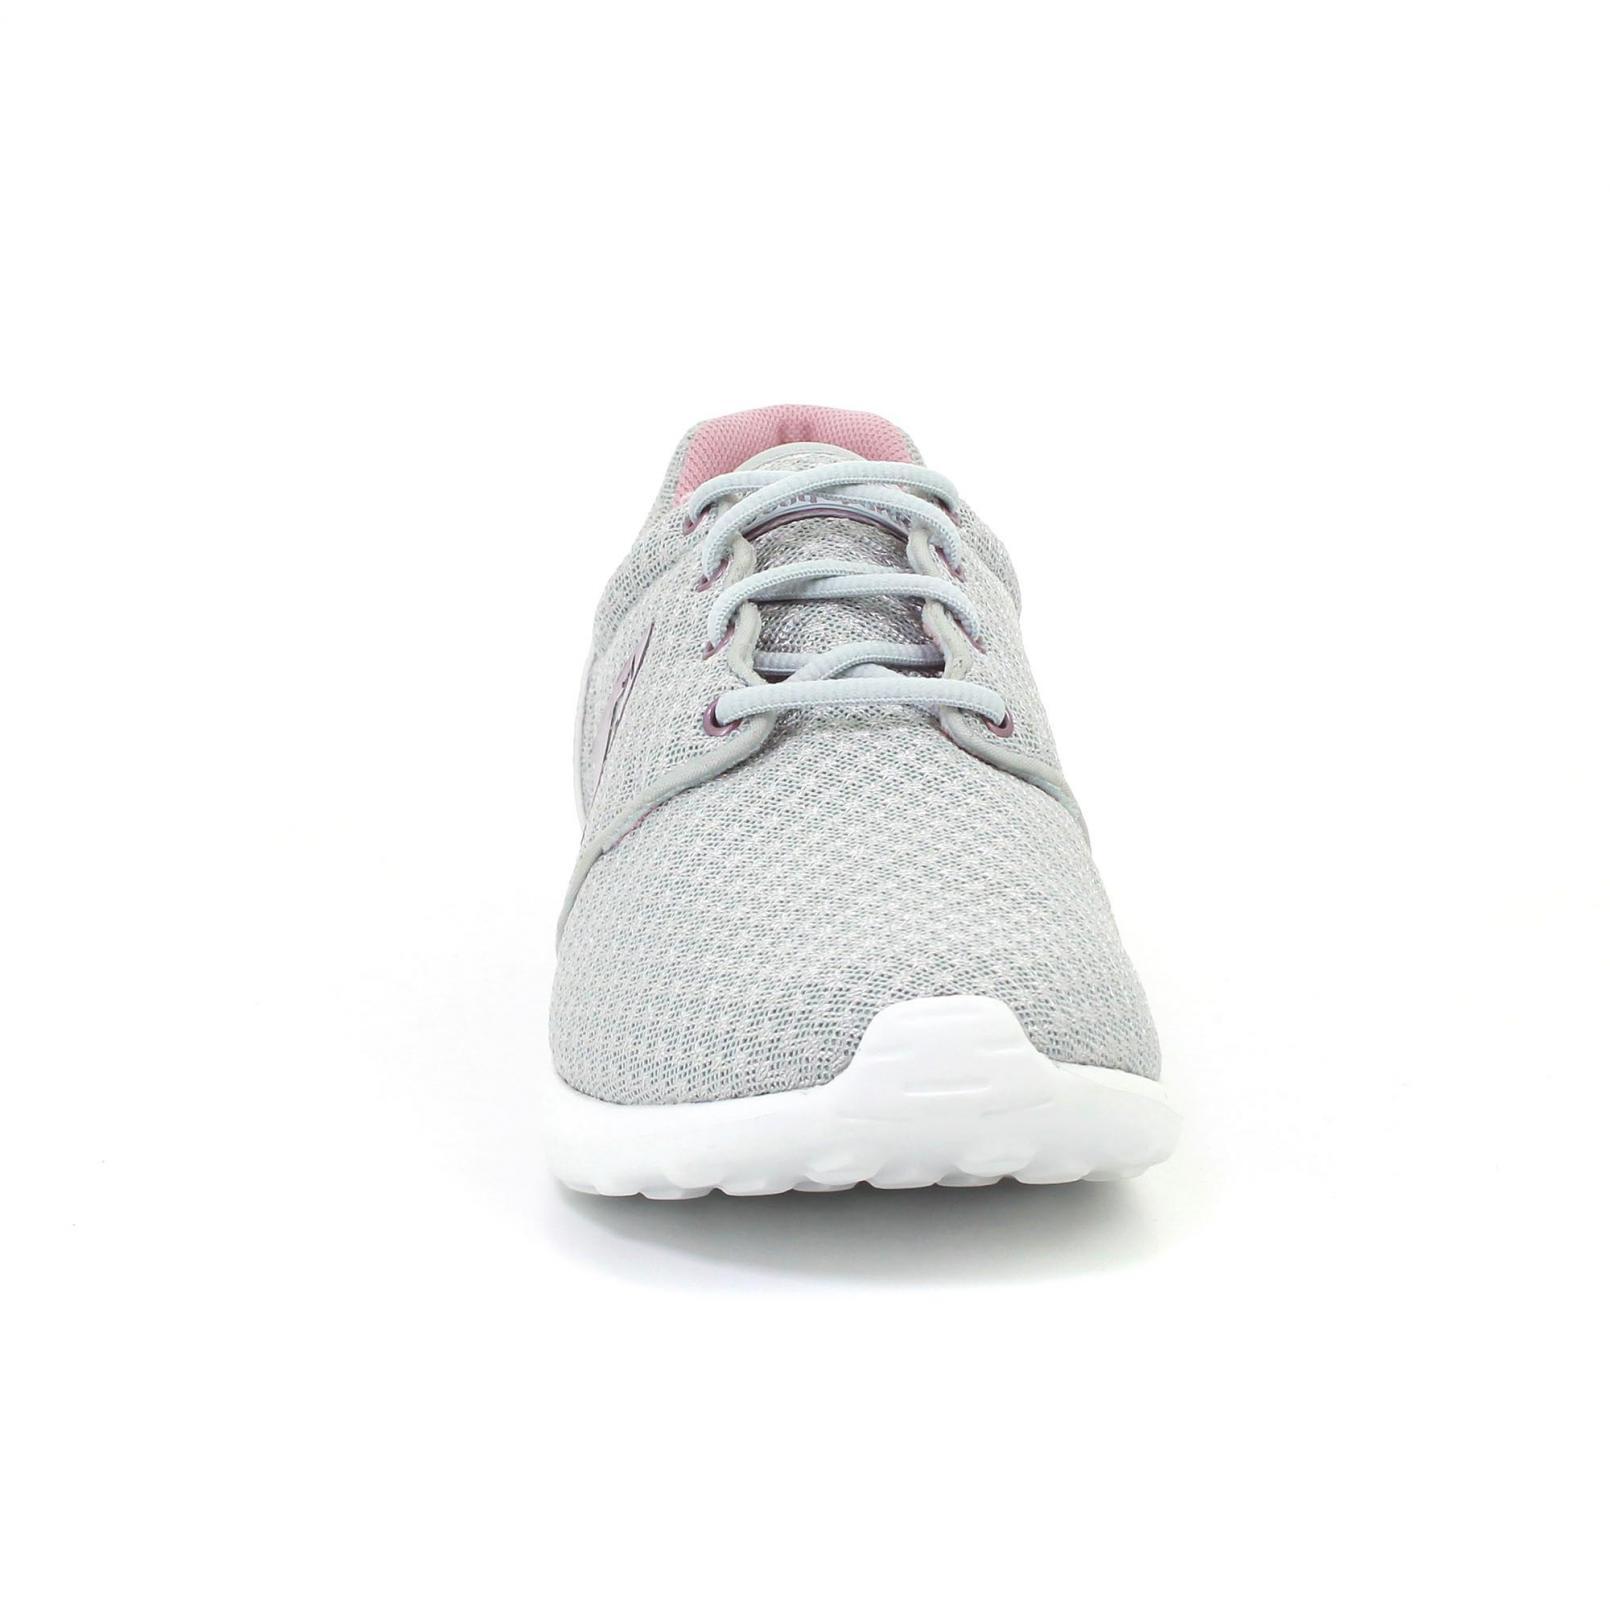 Shoes – Le Coq Sportif Dynacomf Gs Feminine Mesh/Metallic Grey/Pink